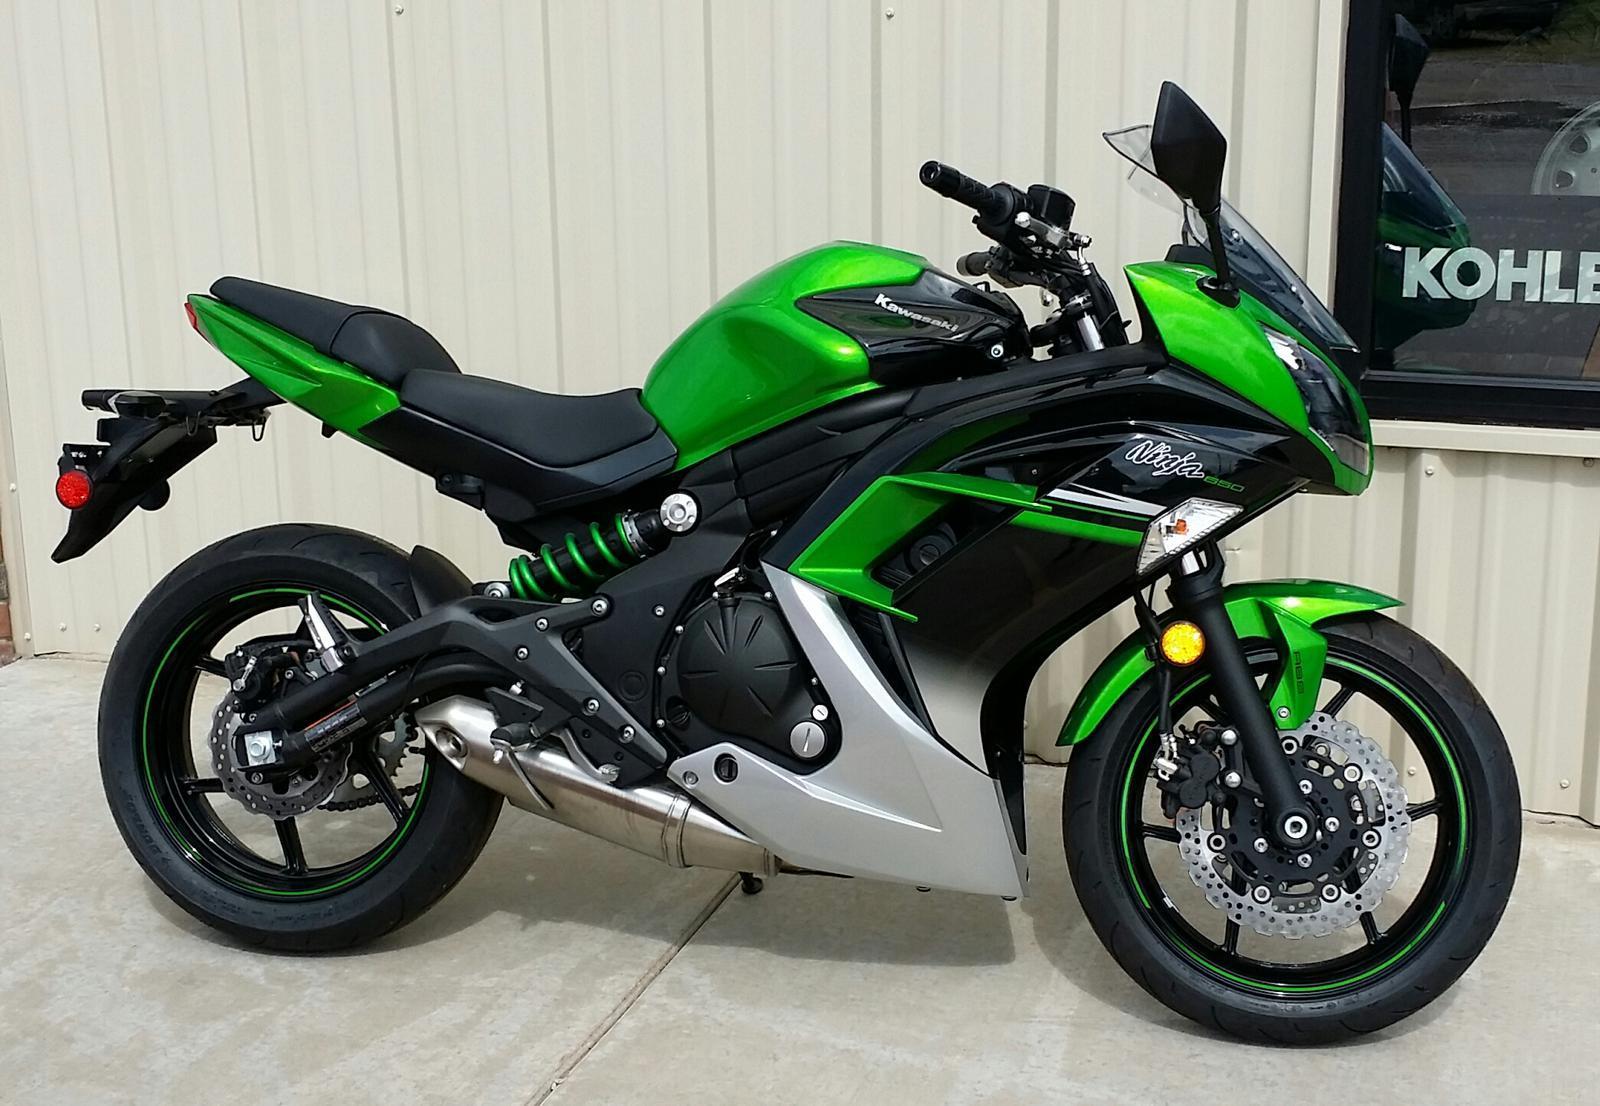 2016 Kawasaki Ninja® 650 ABS for sale in Hesston, KS | Dan's Cycle ...